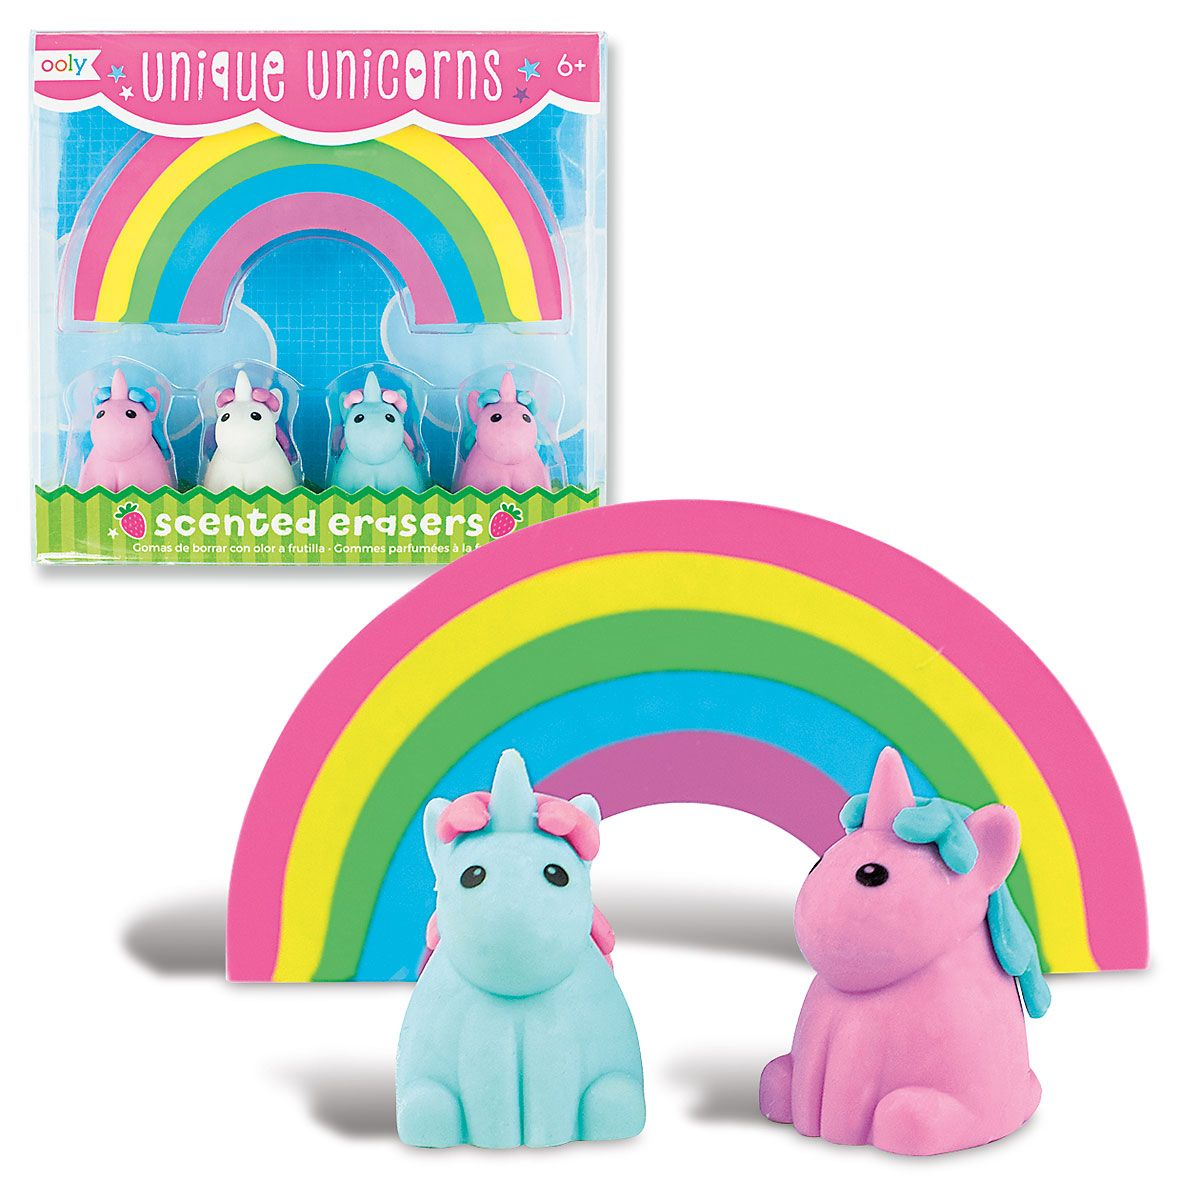 Unicorn Scented Erasers